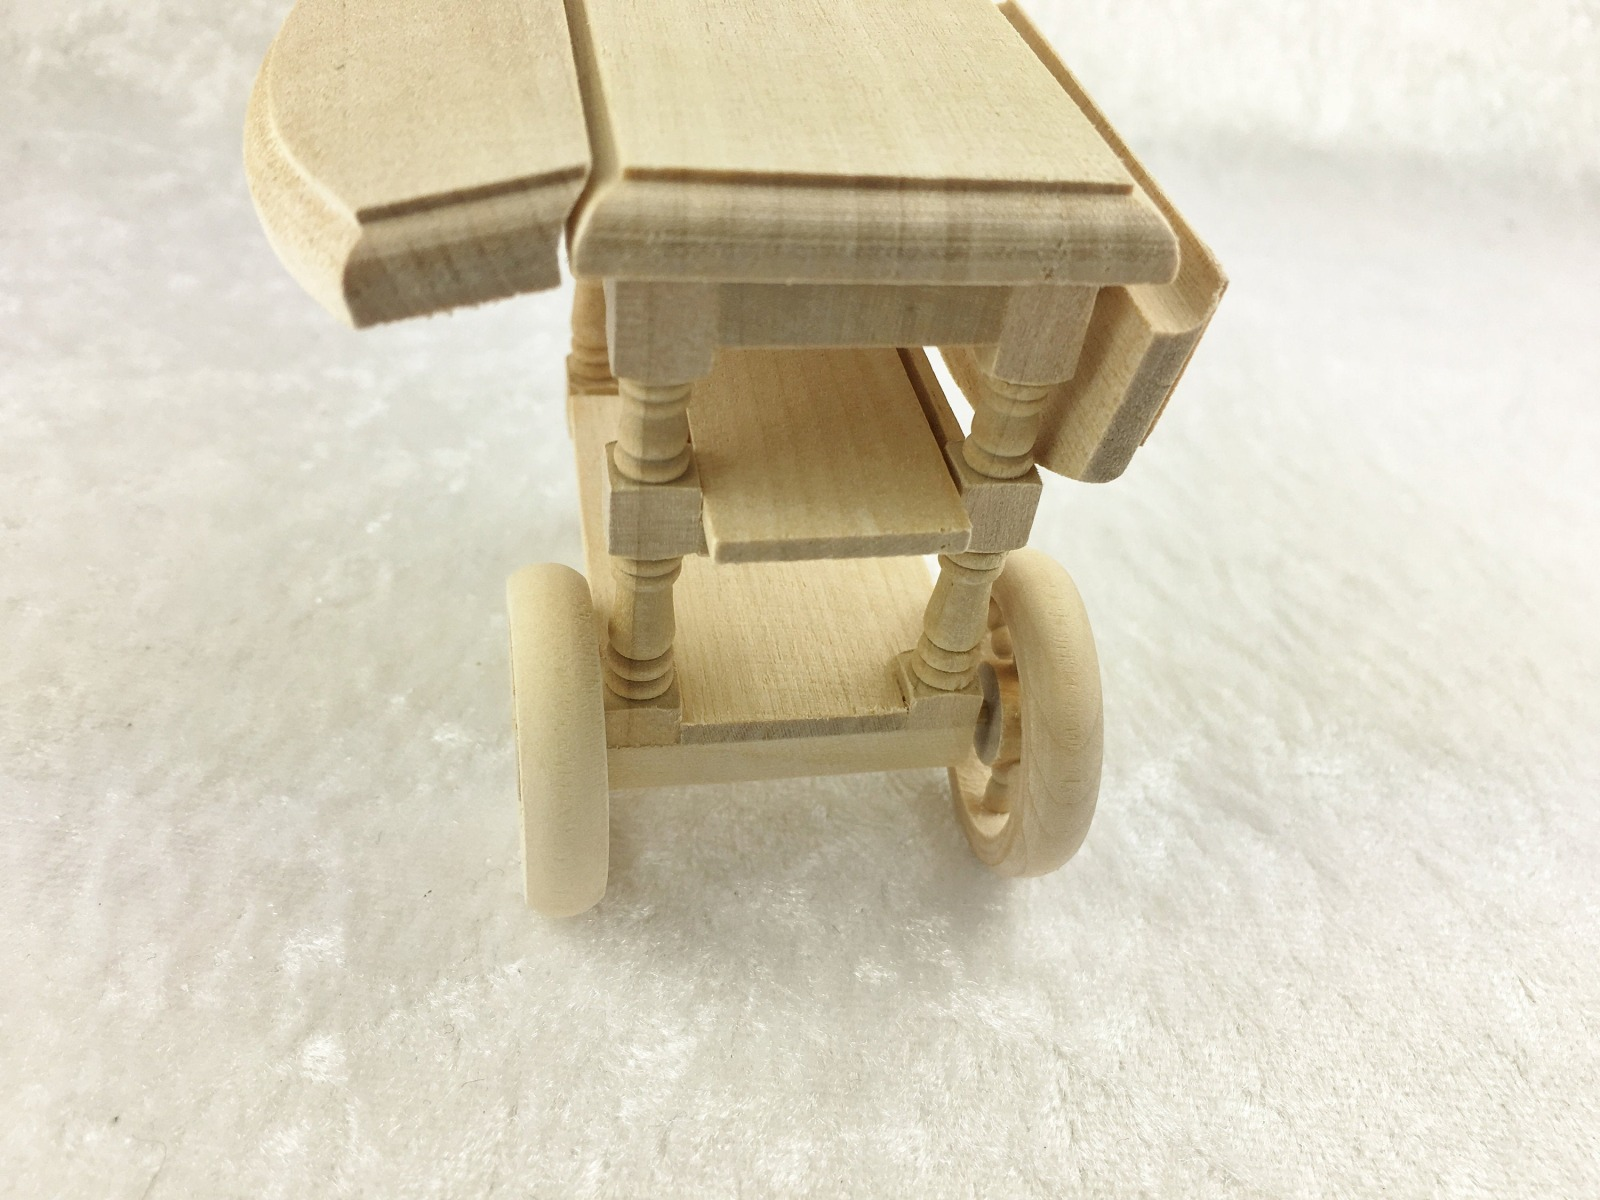 Teewagen 1:12 Miniatur 9